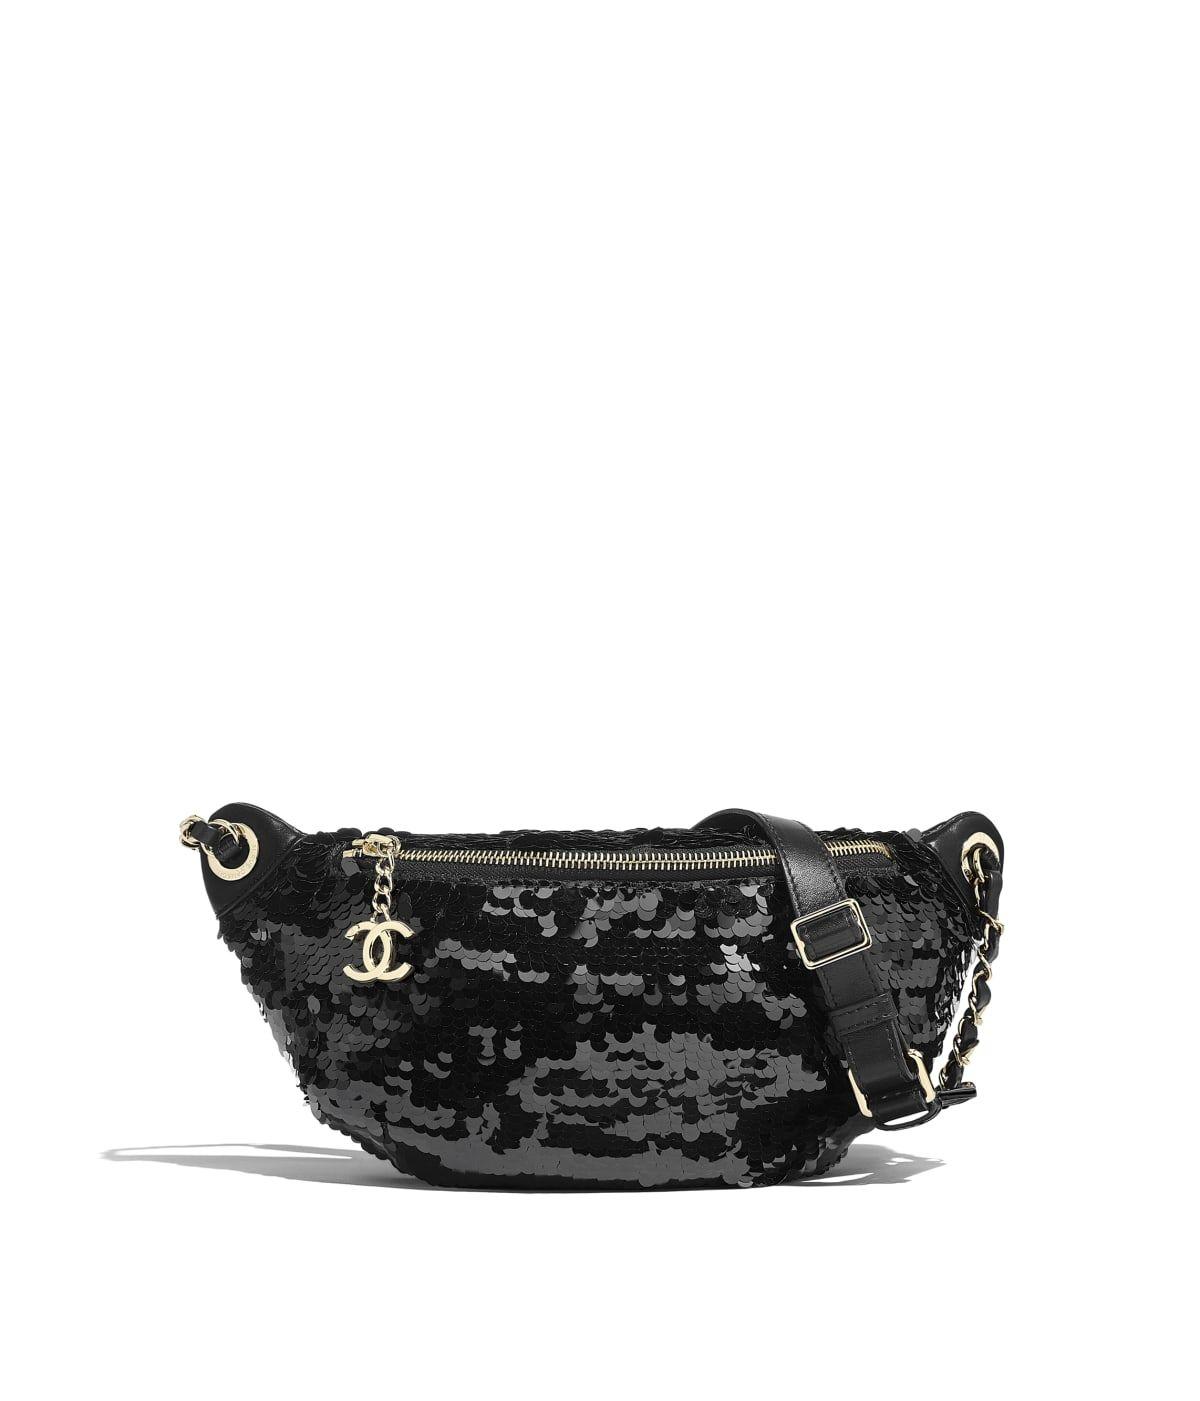 483de462fc4a Handbags of the Spring-Summer 2019 Pre-Collection CHANEL Fashion collection    Waist Bag